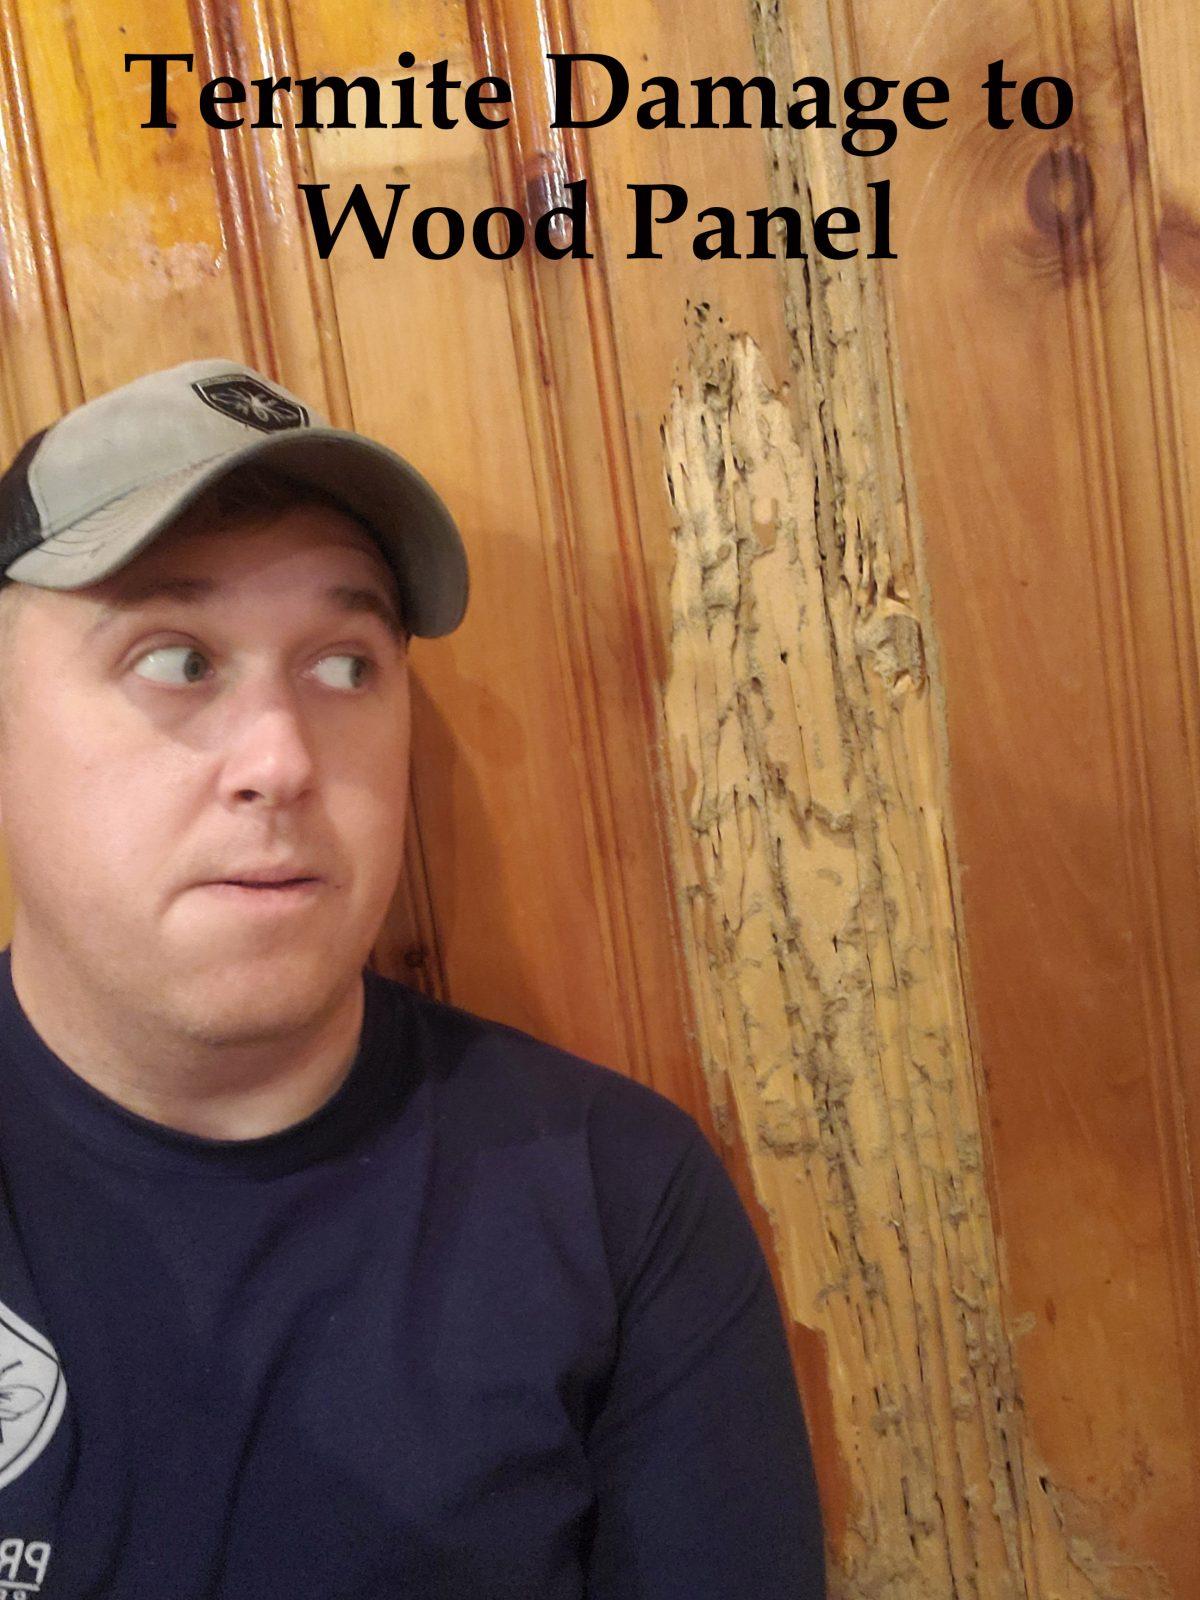 termite damage to wood paneling